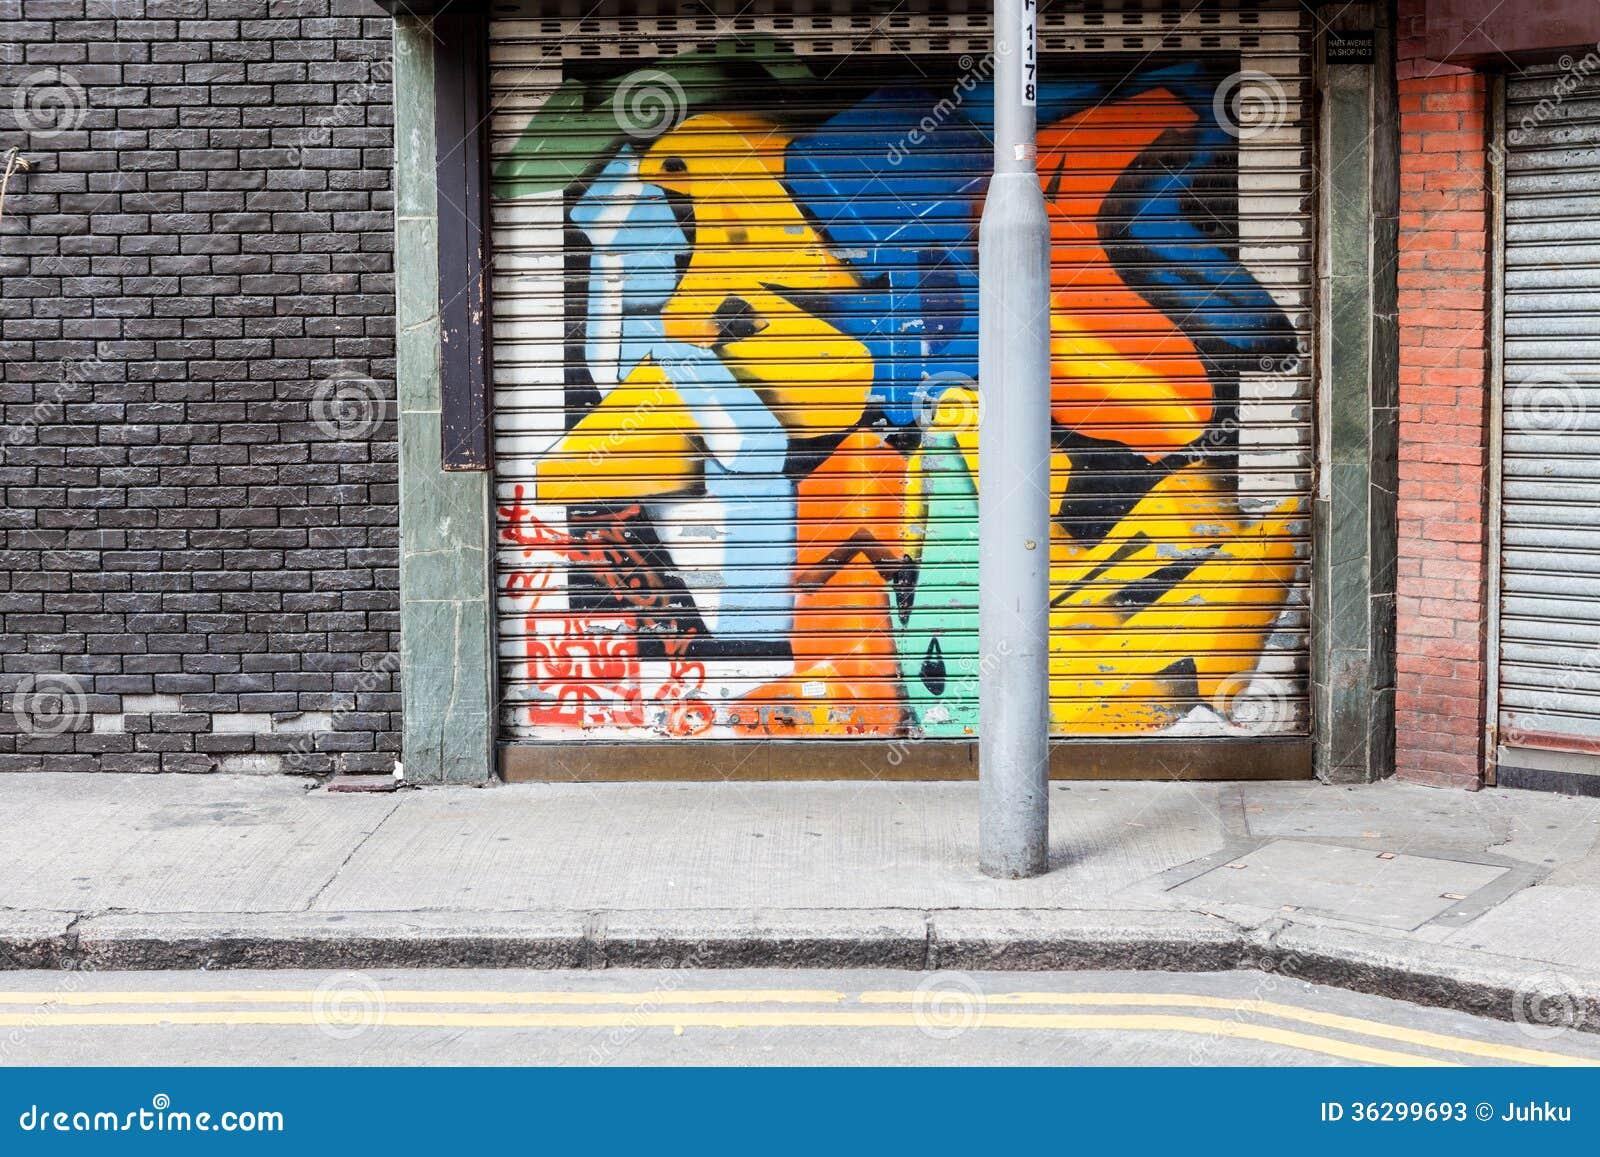 empty street graffiti background stock photos image